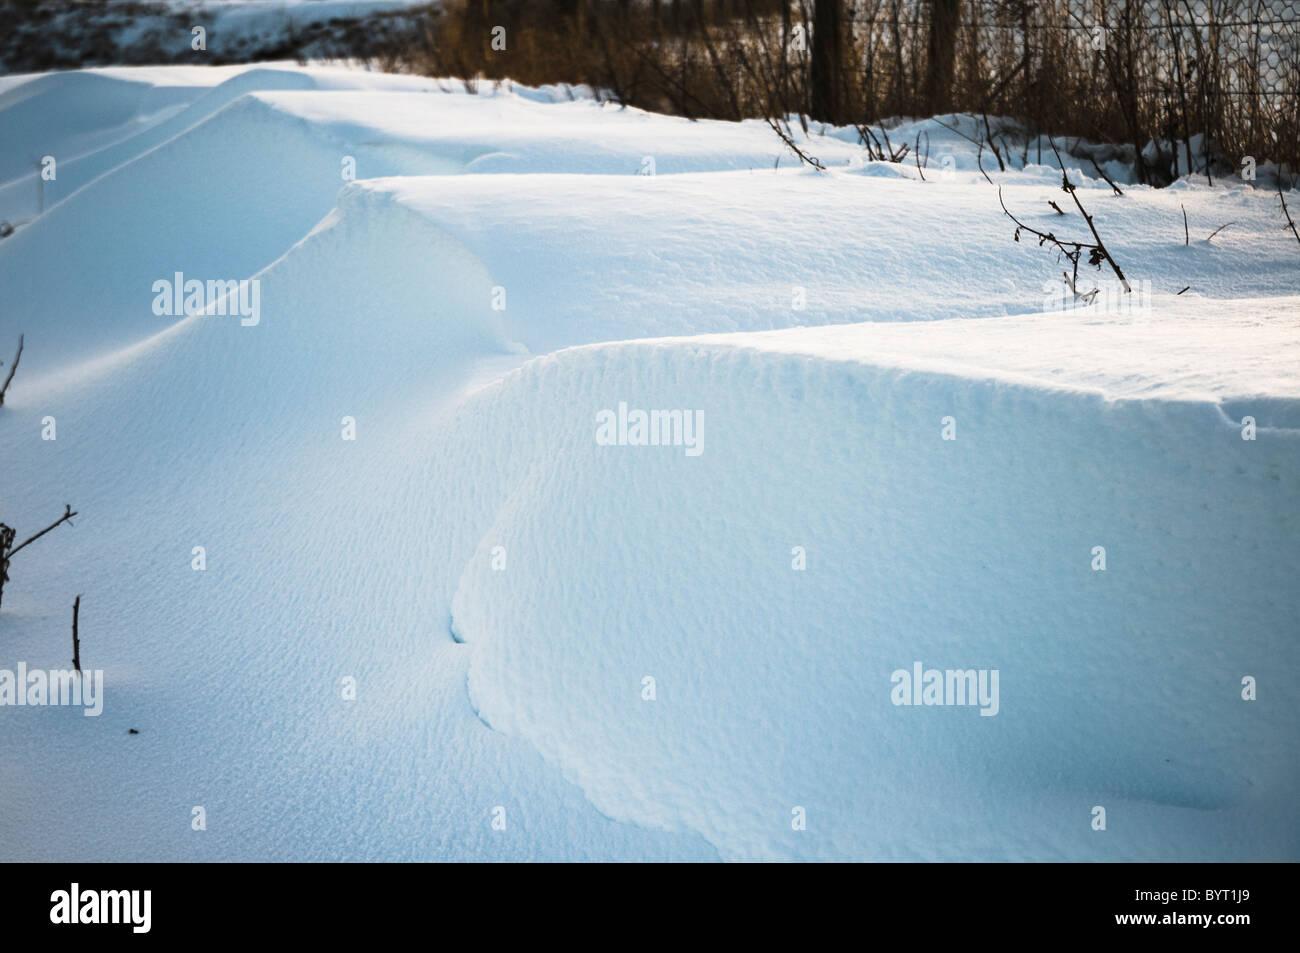 Snow drifts - Stock Image